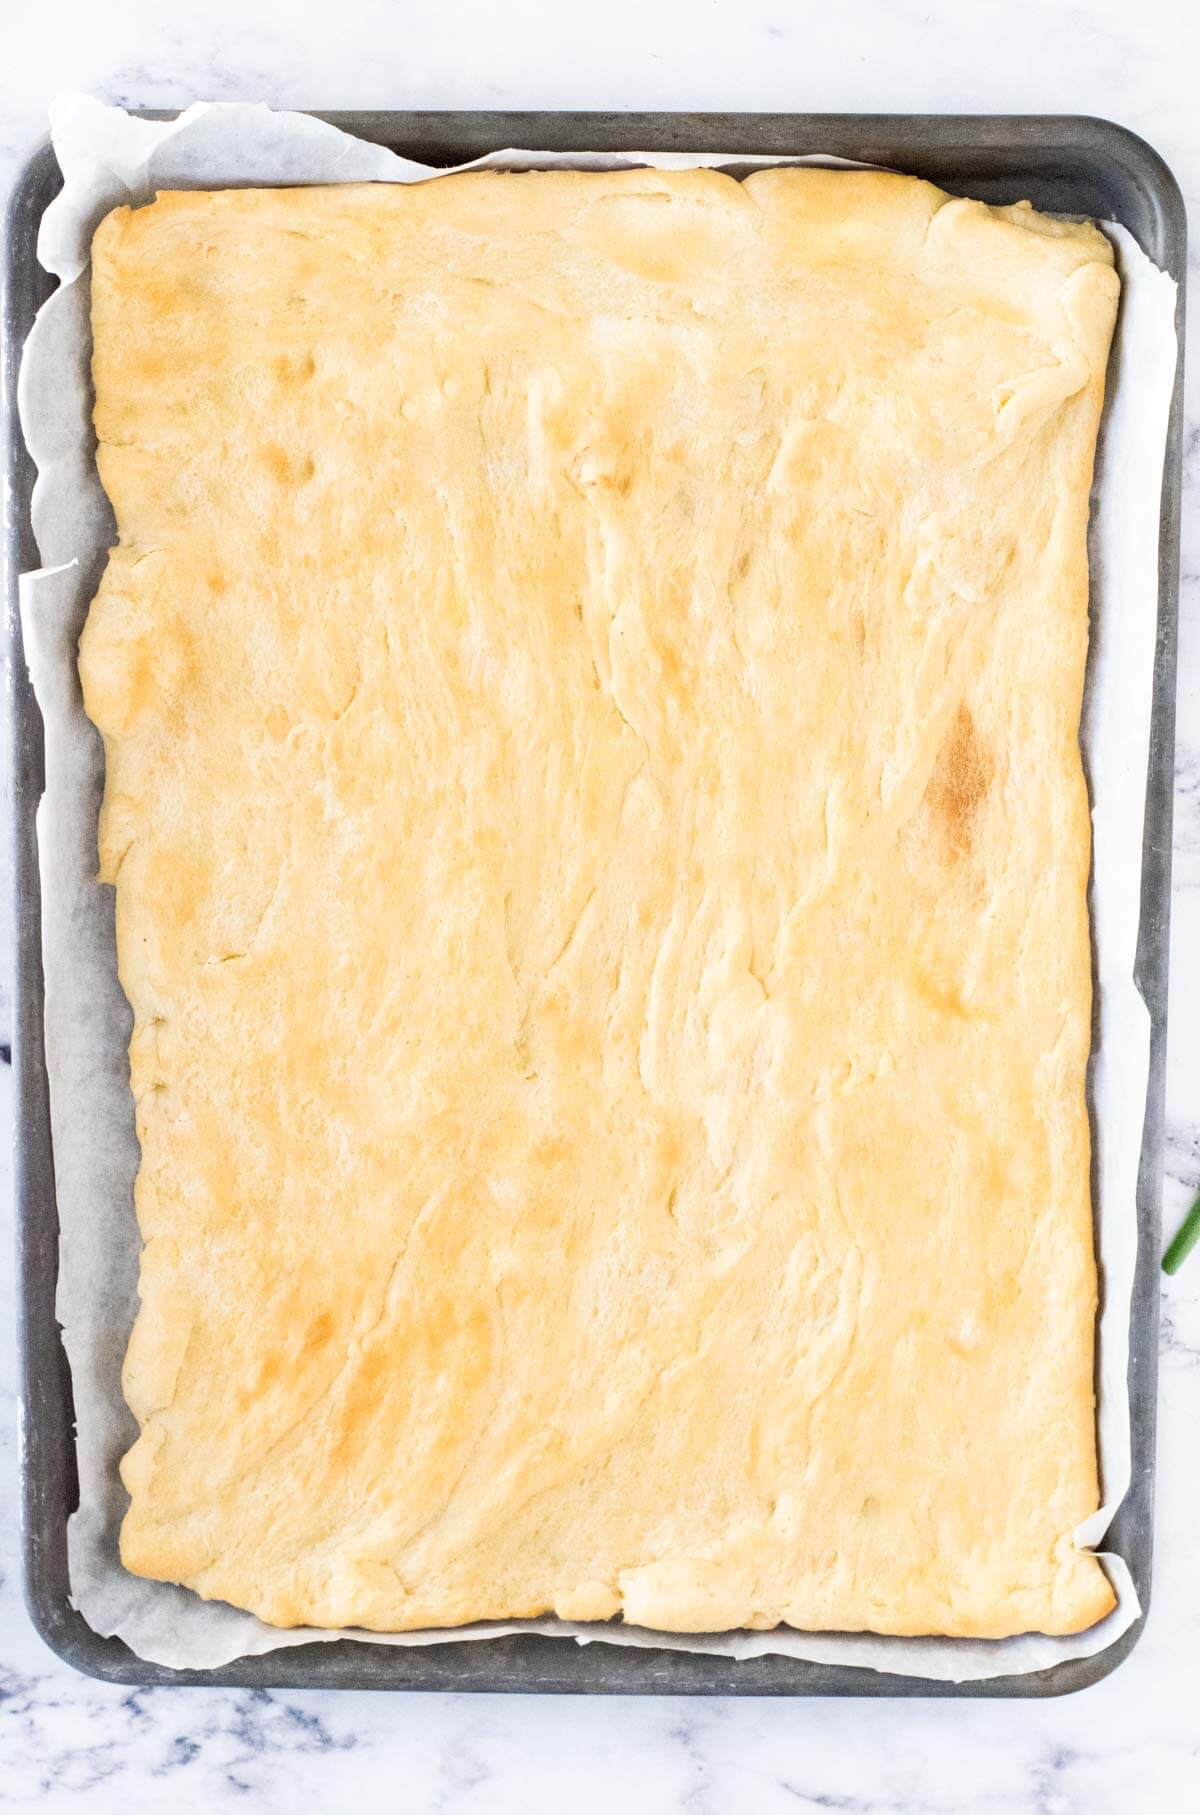 Baked crescent roll dough.